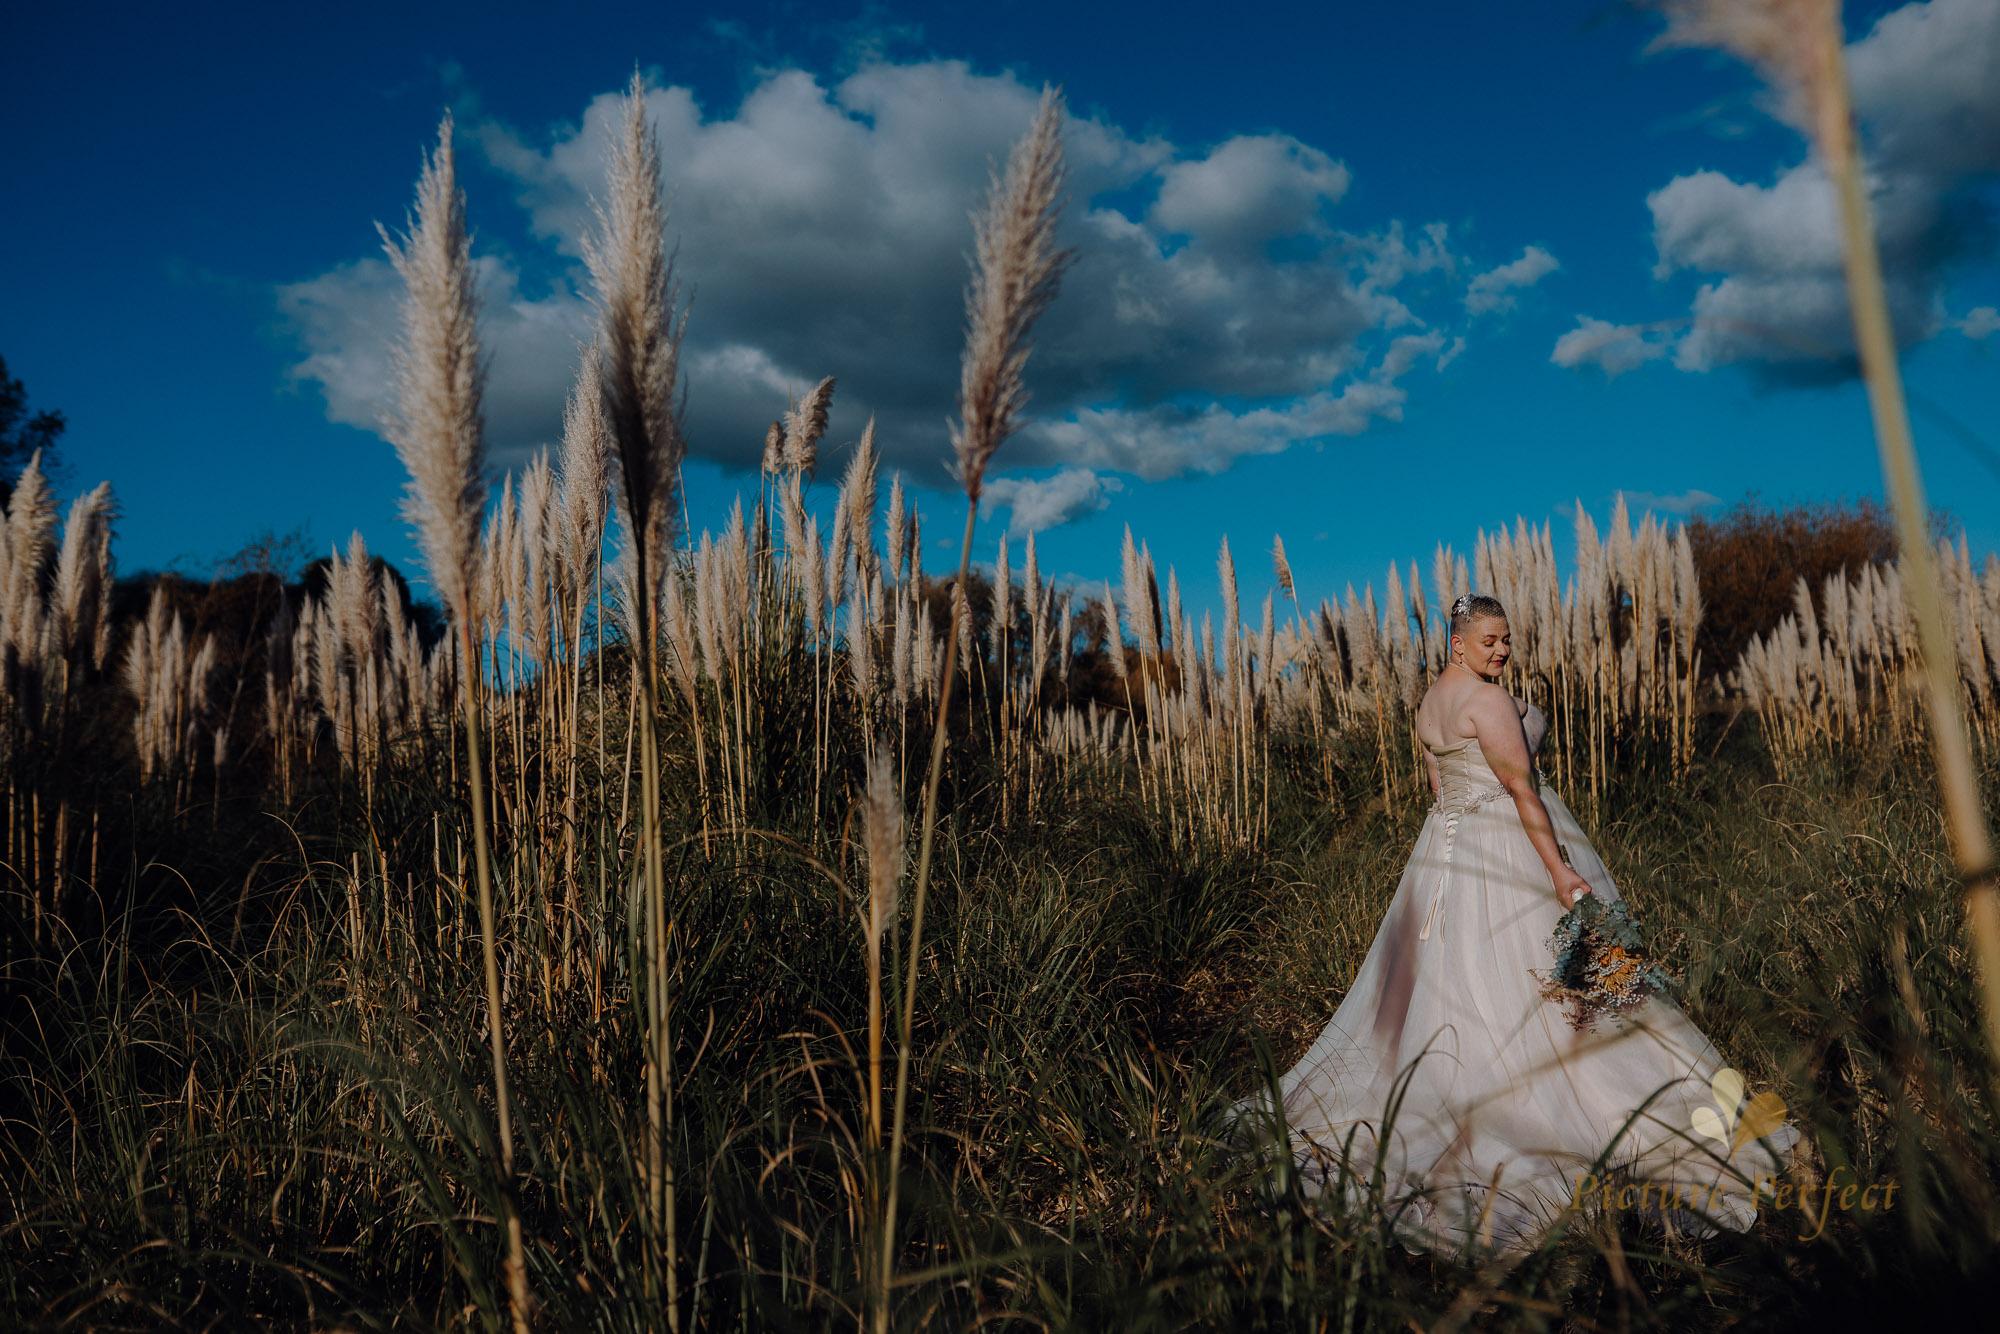 Manawatu beach bridal photography during golden hour with Tina 0030